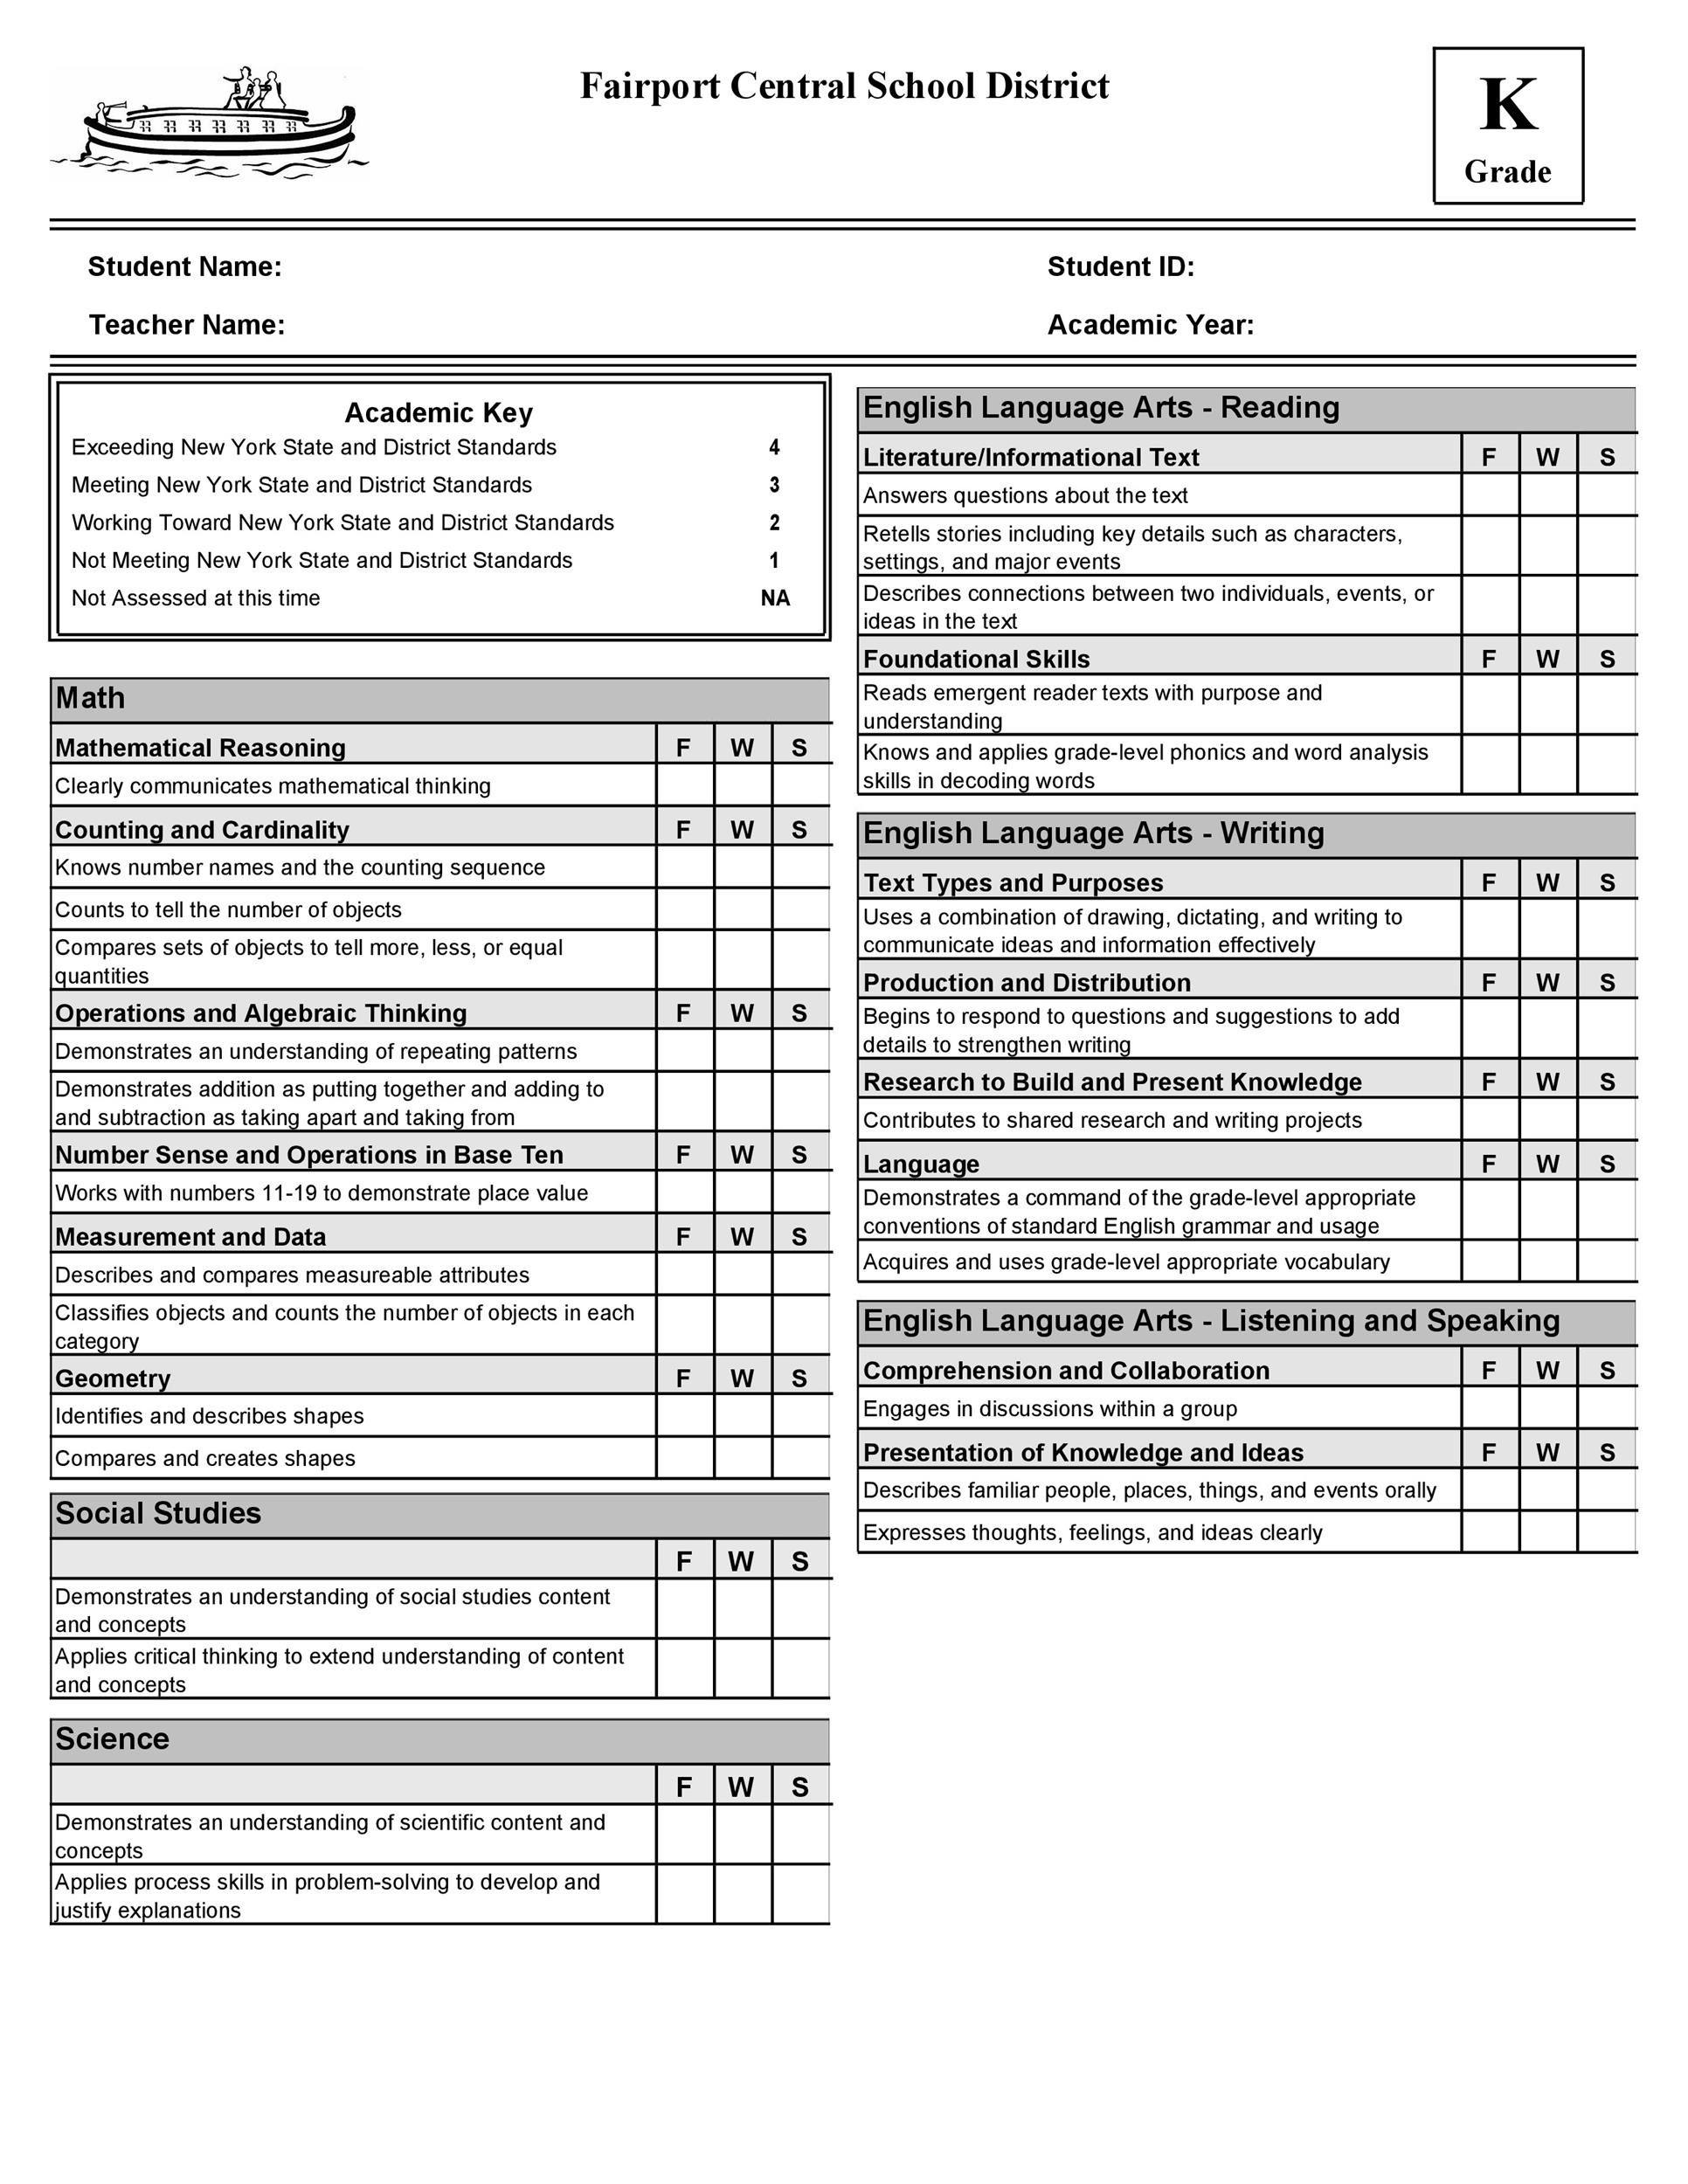 006 Incredible Junior High School Report Card Template Example Full